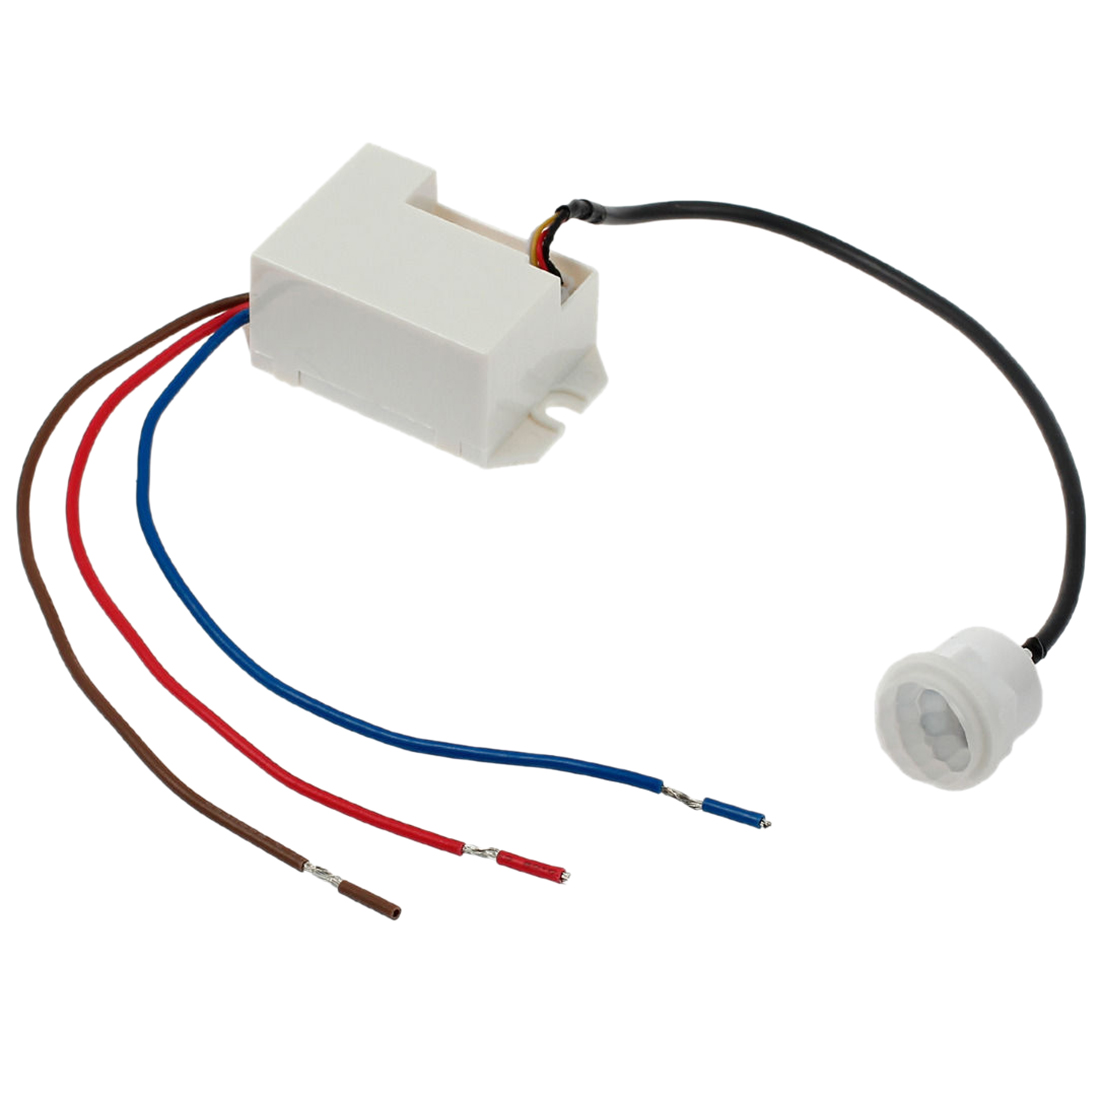 360 Degree Recessed PIR Sensor Detector Ceiling Occupancy Motion Light Switch360 Degree Recessed PIR Sensor Detector Ceiling Occupancy Motion Light Switch